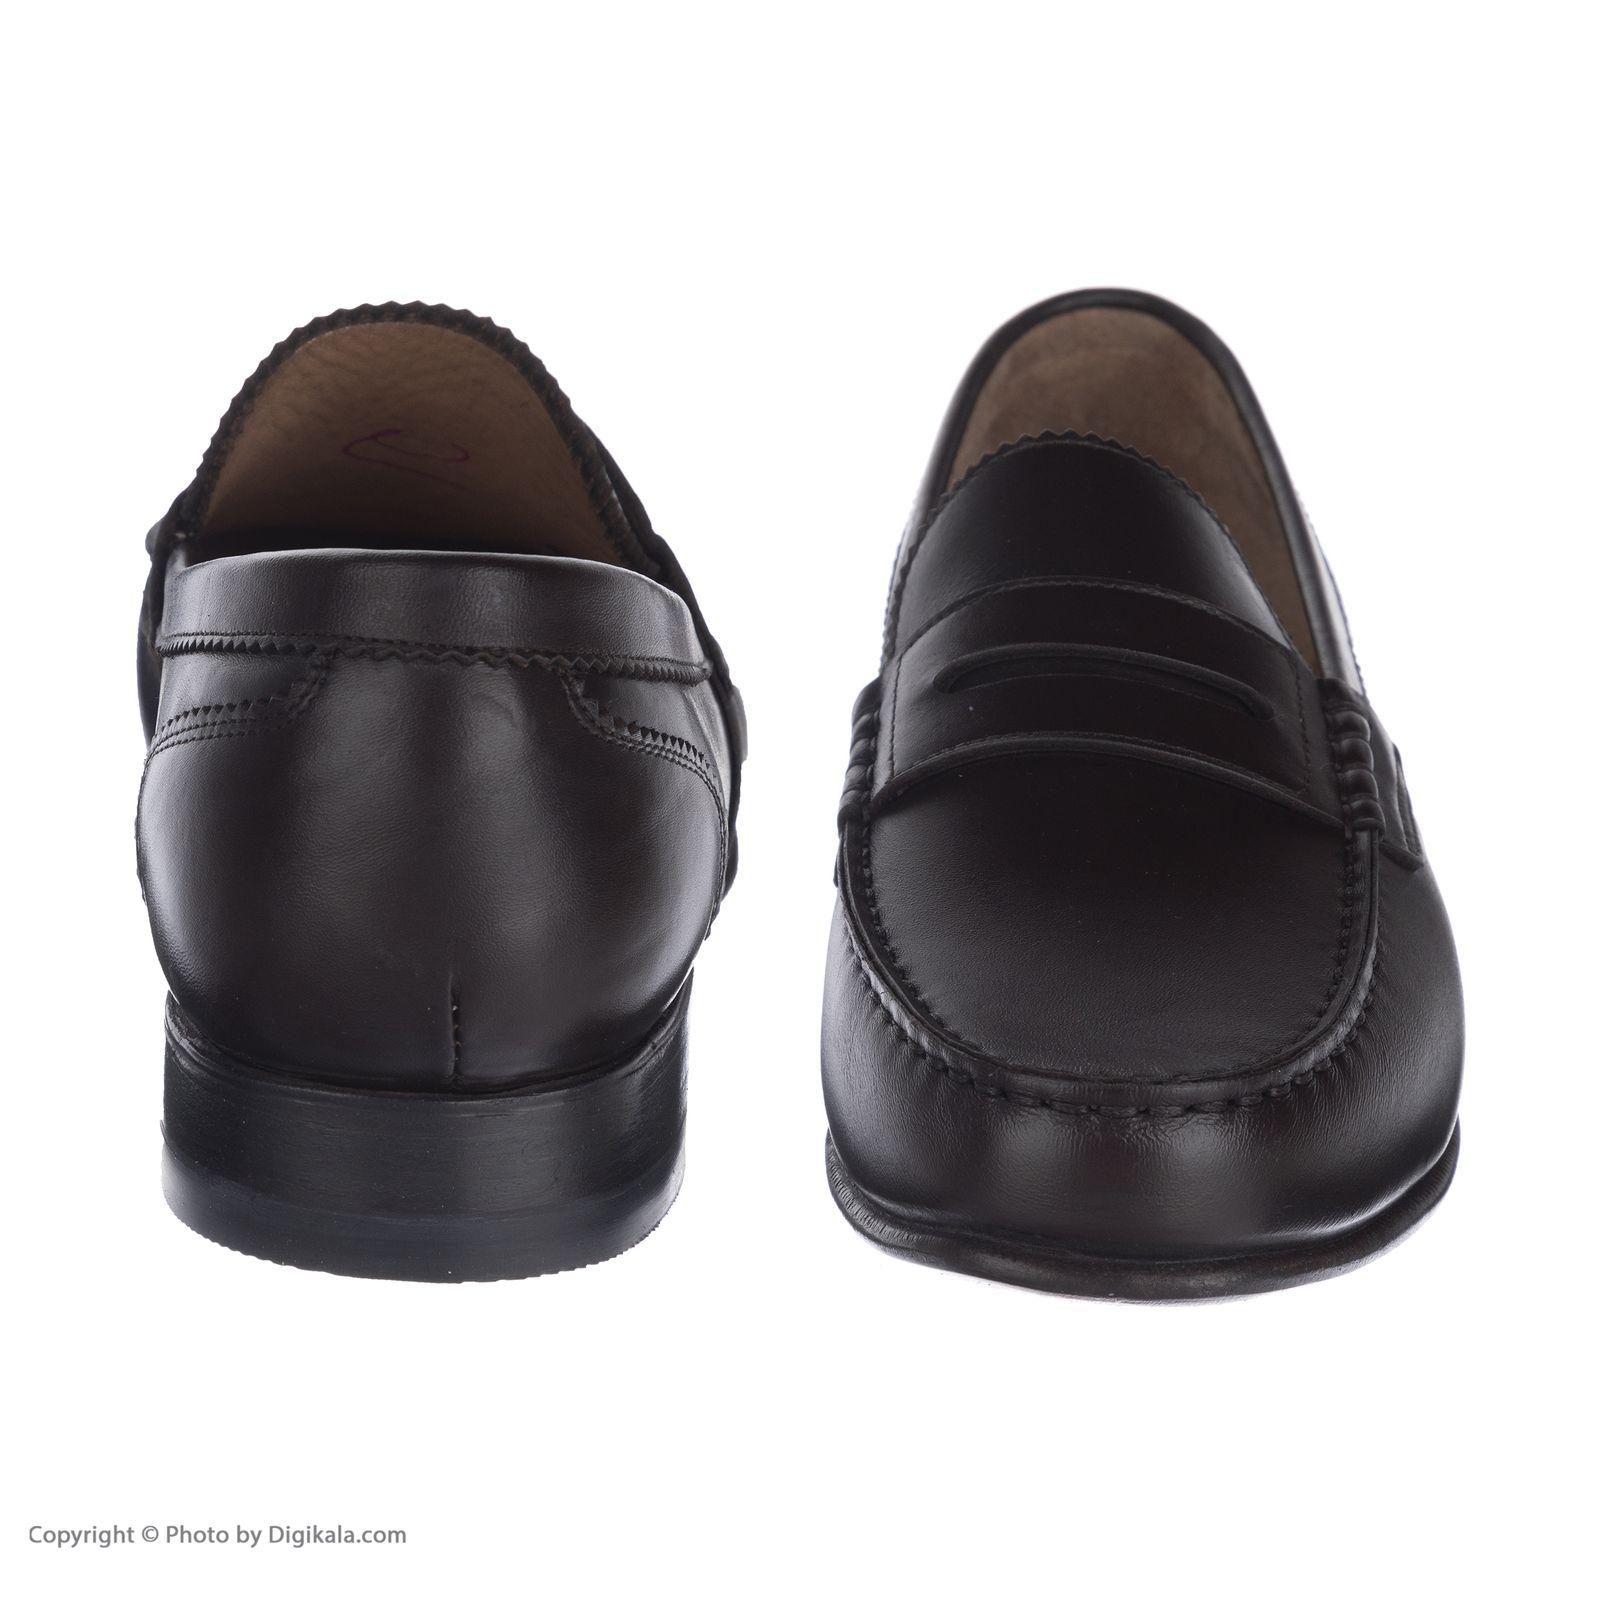 کفش مردانه نظری کد 436 -  - 2